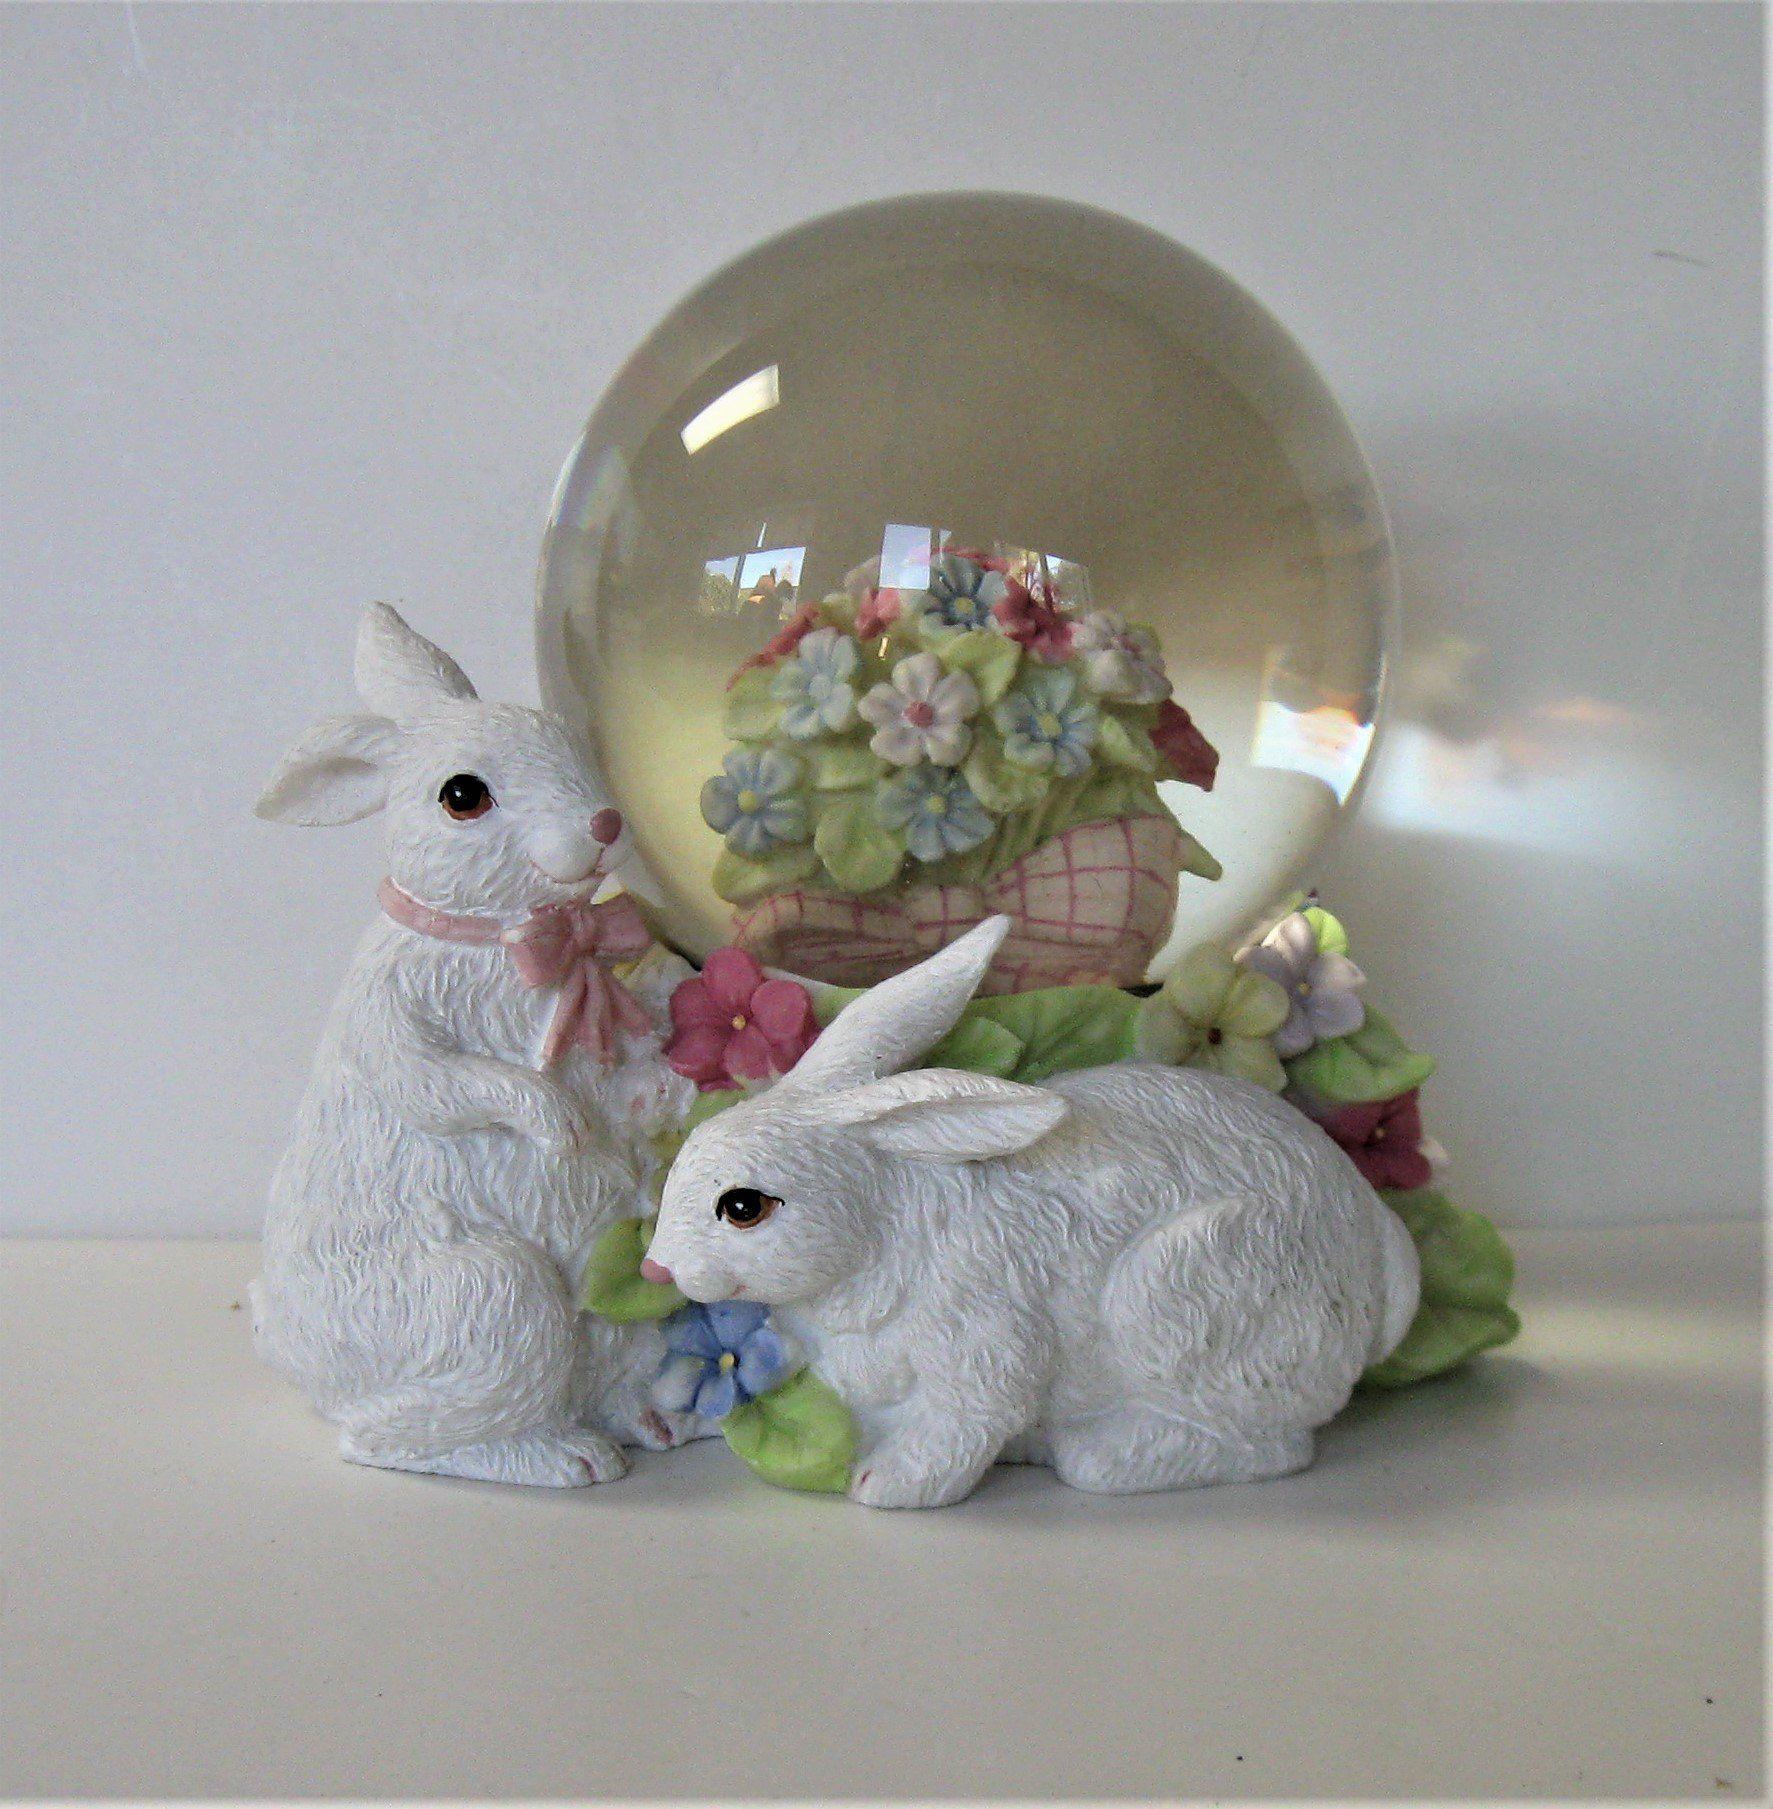 "Vintage Bunny Rabbits Snow Globe, 12"" x 12, garden flowers, Shabby"